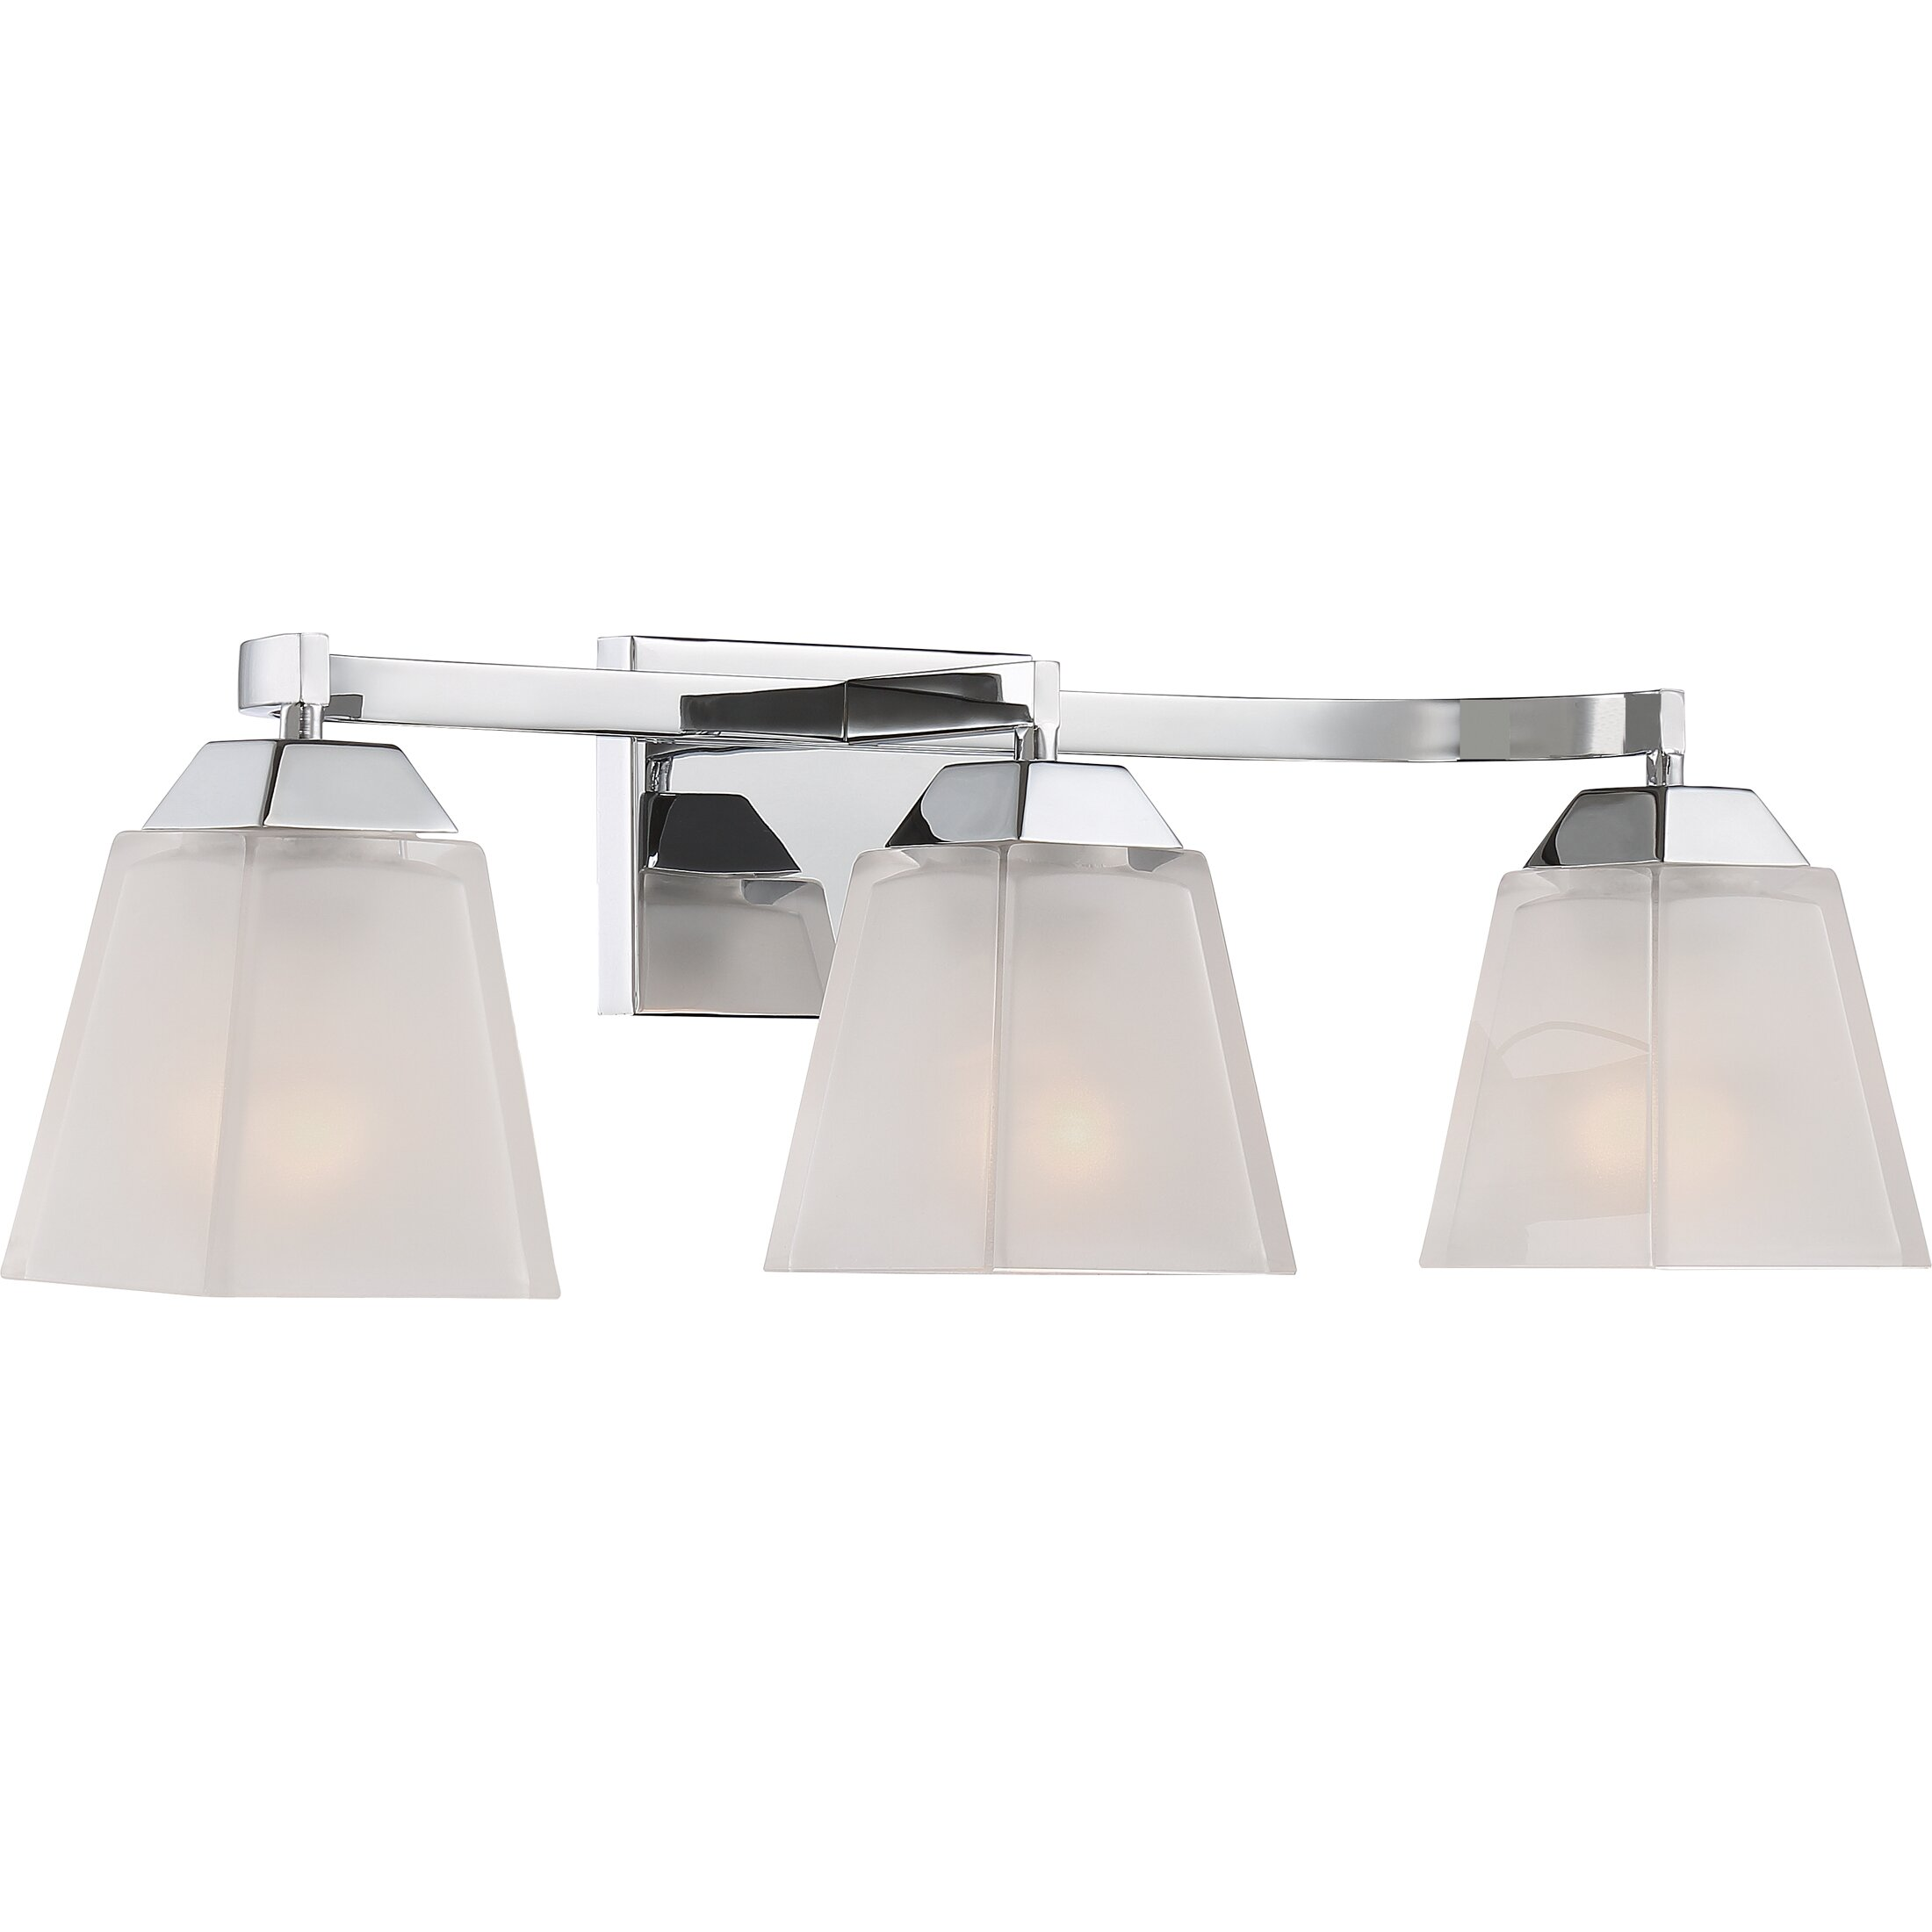 Quoizel Loft 3 Light Vanity Light Reviews Wayfair